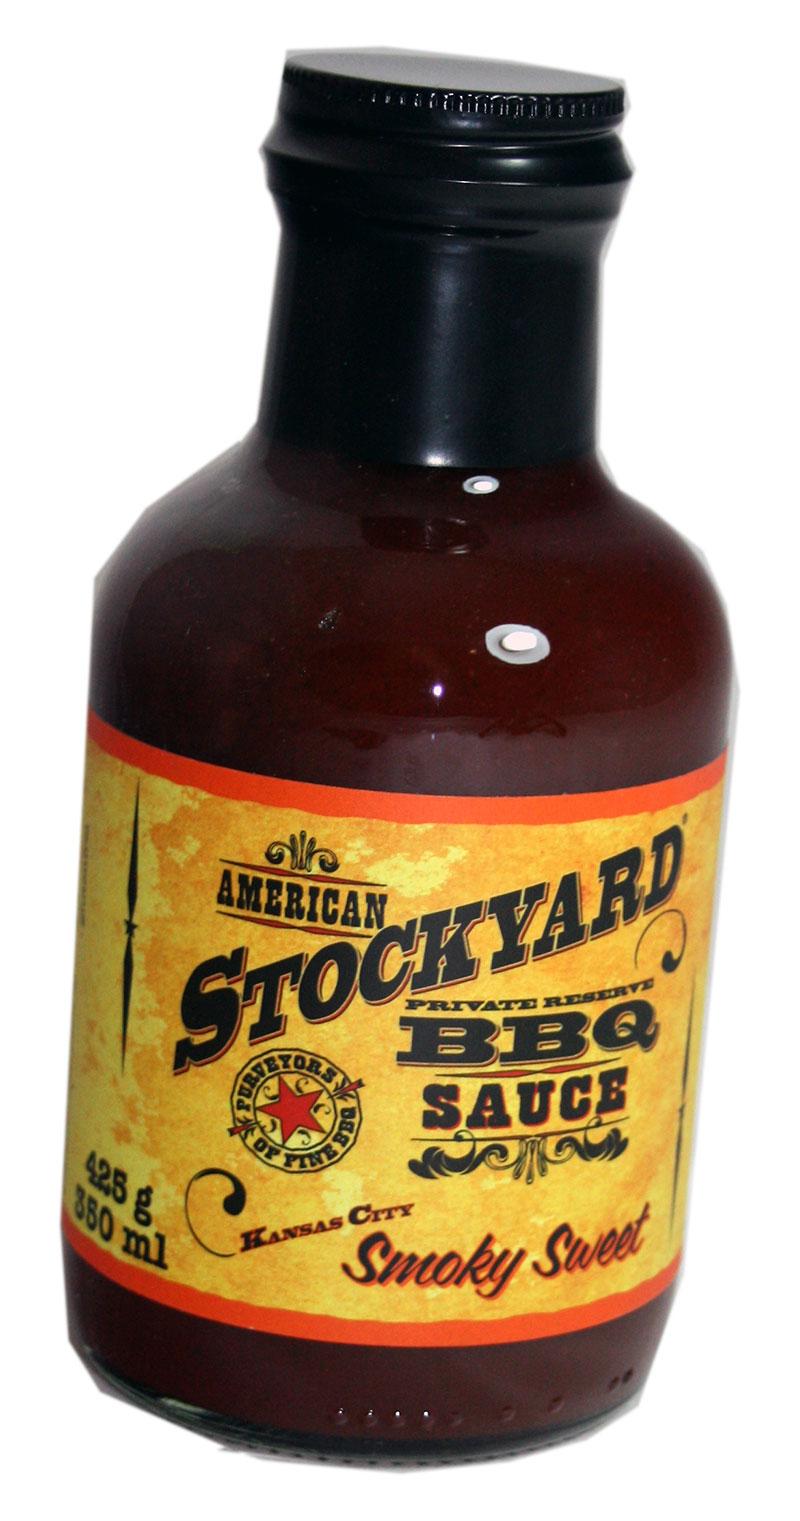 American Stockyard Smoky Sweet BBQ Sauce - klein